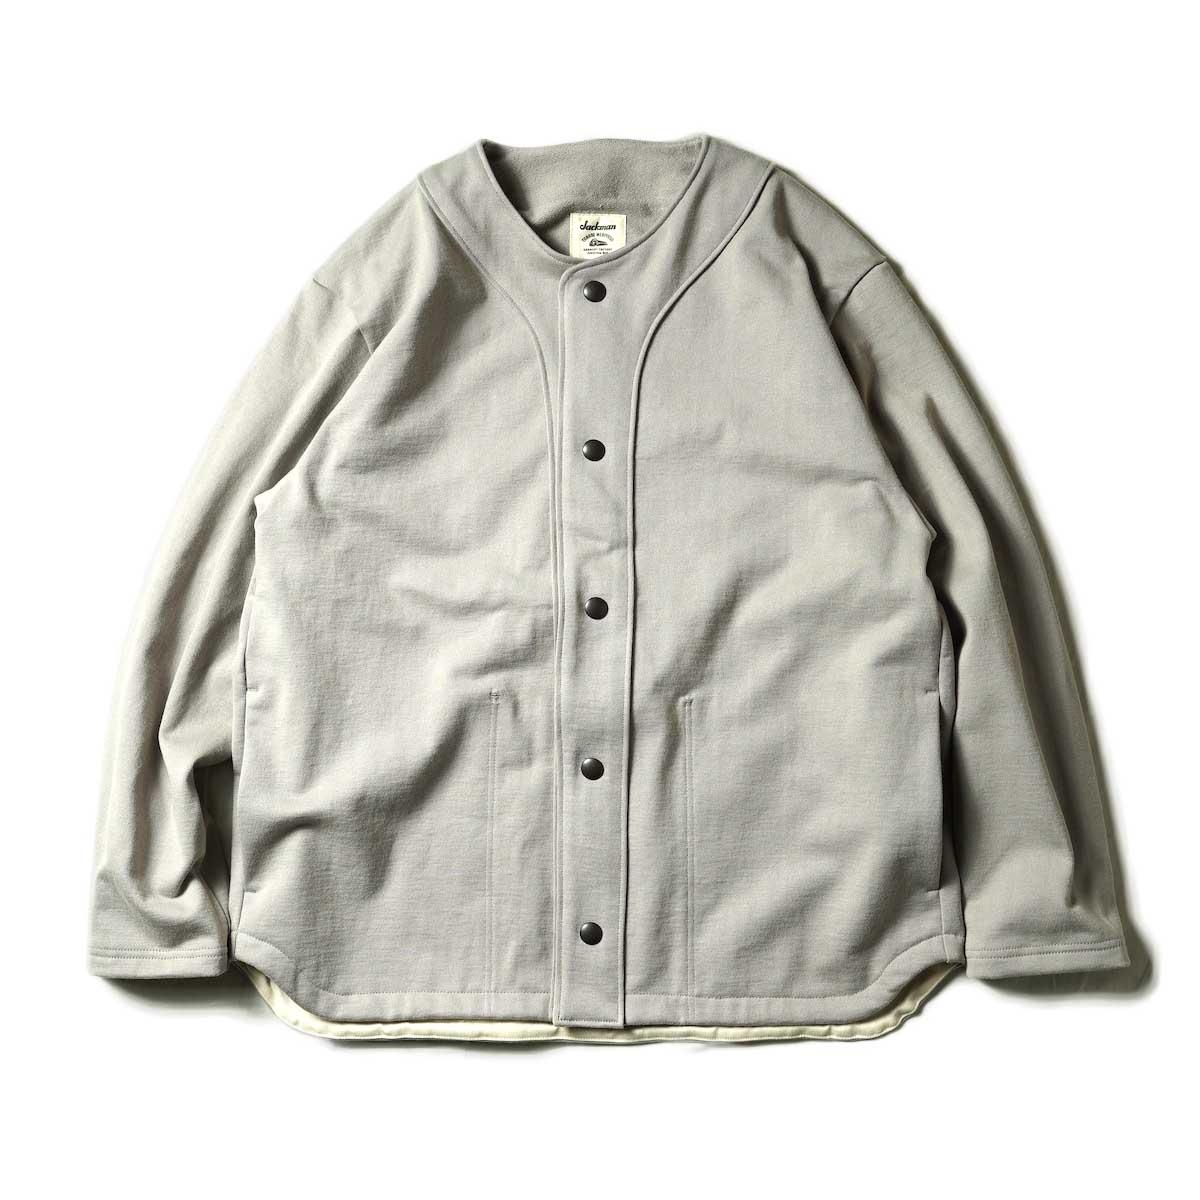 Jackman / Dotsume UF Jacket (Solid Gray)